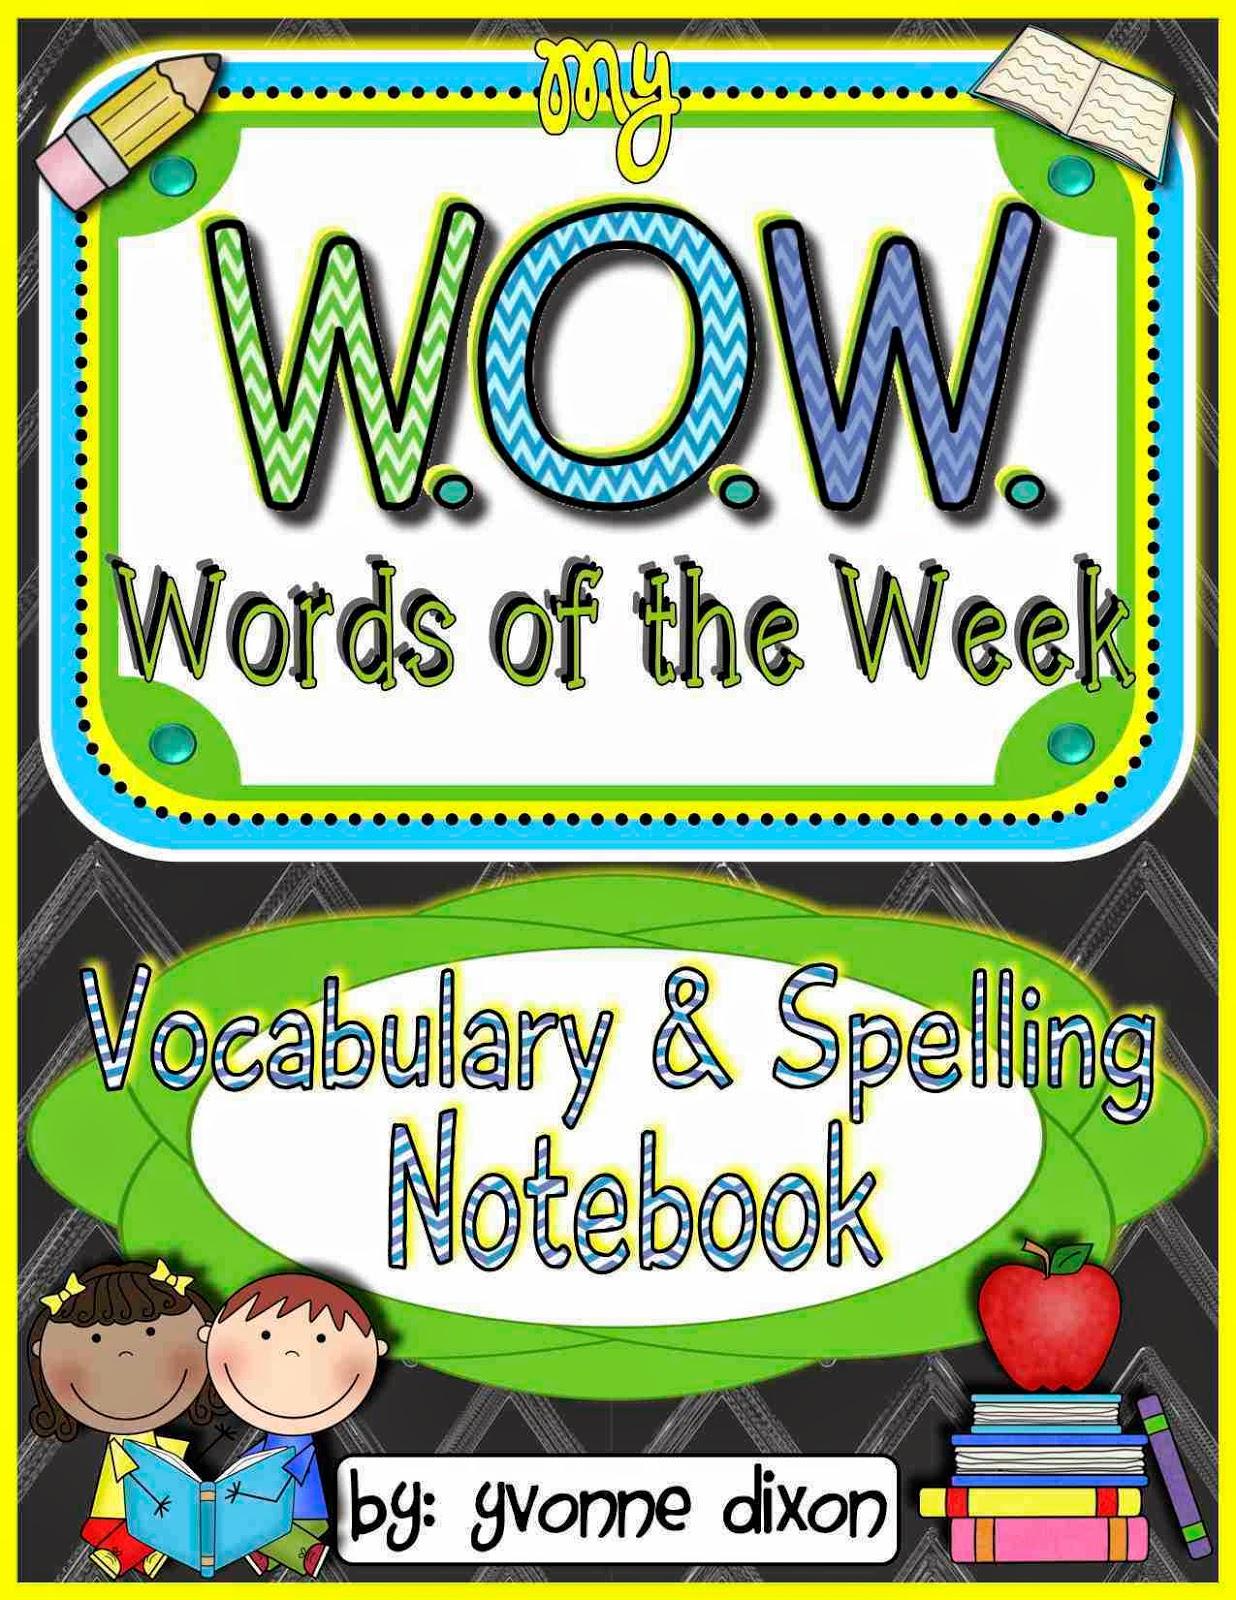 Notebook clipart spelling Teacherspayteachers W W For Words